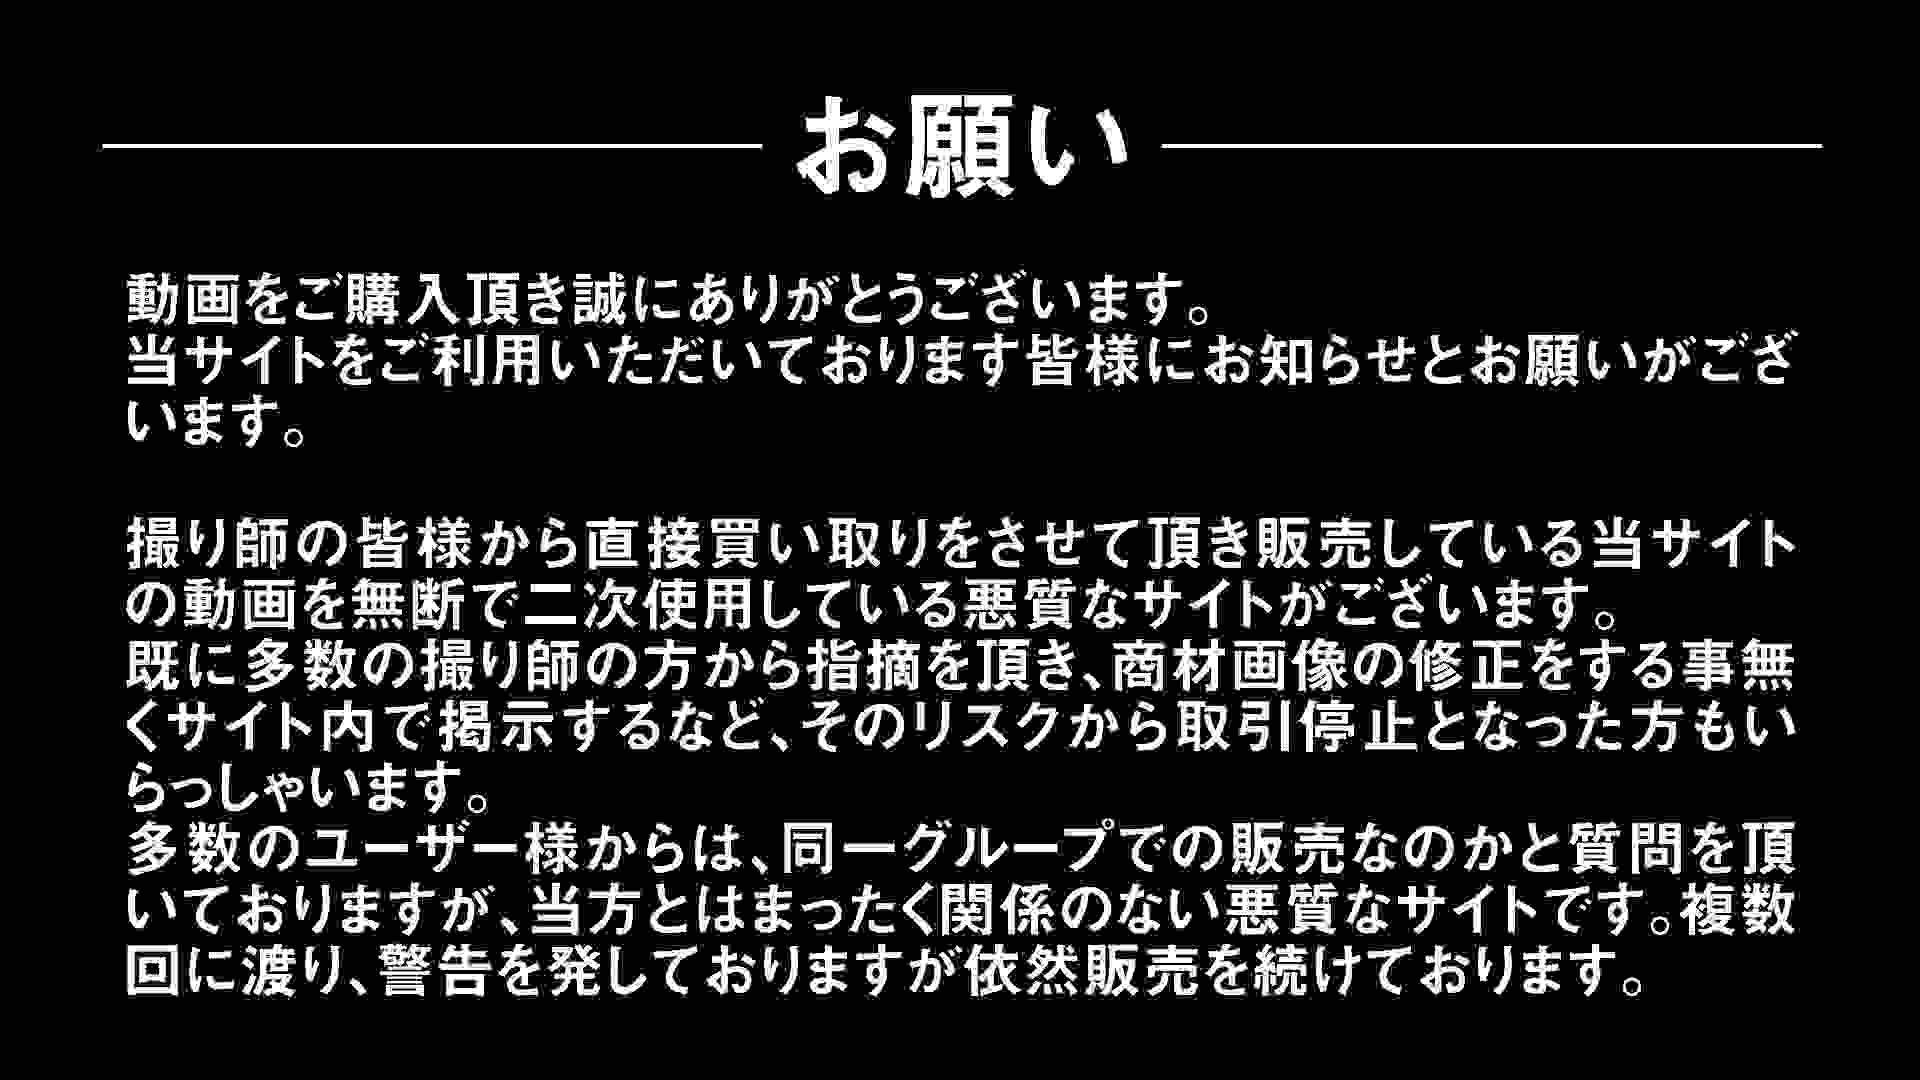 Aquaな露天風呂Vol.296 盗撮シリーズ   露天風呂編  102PIX 29